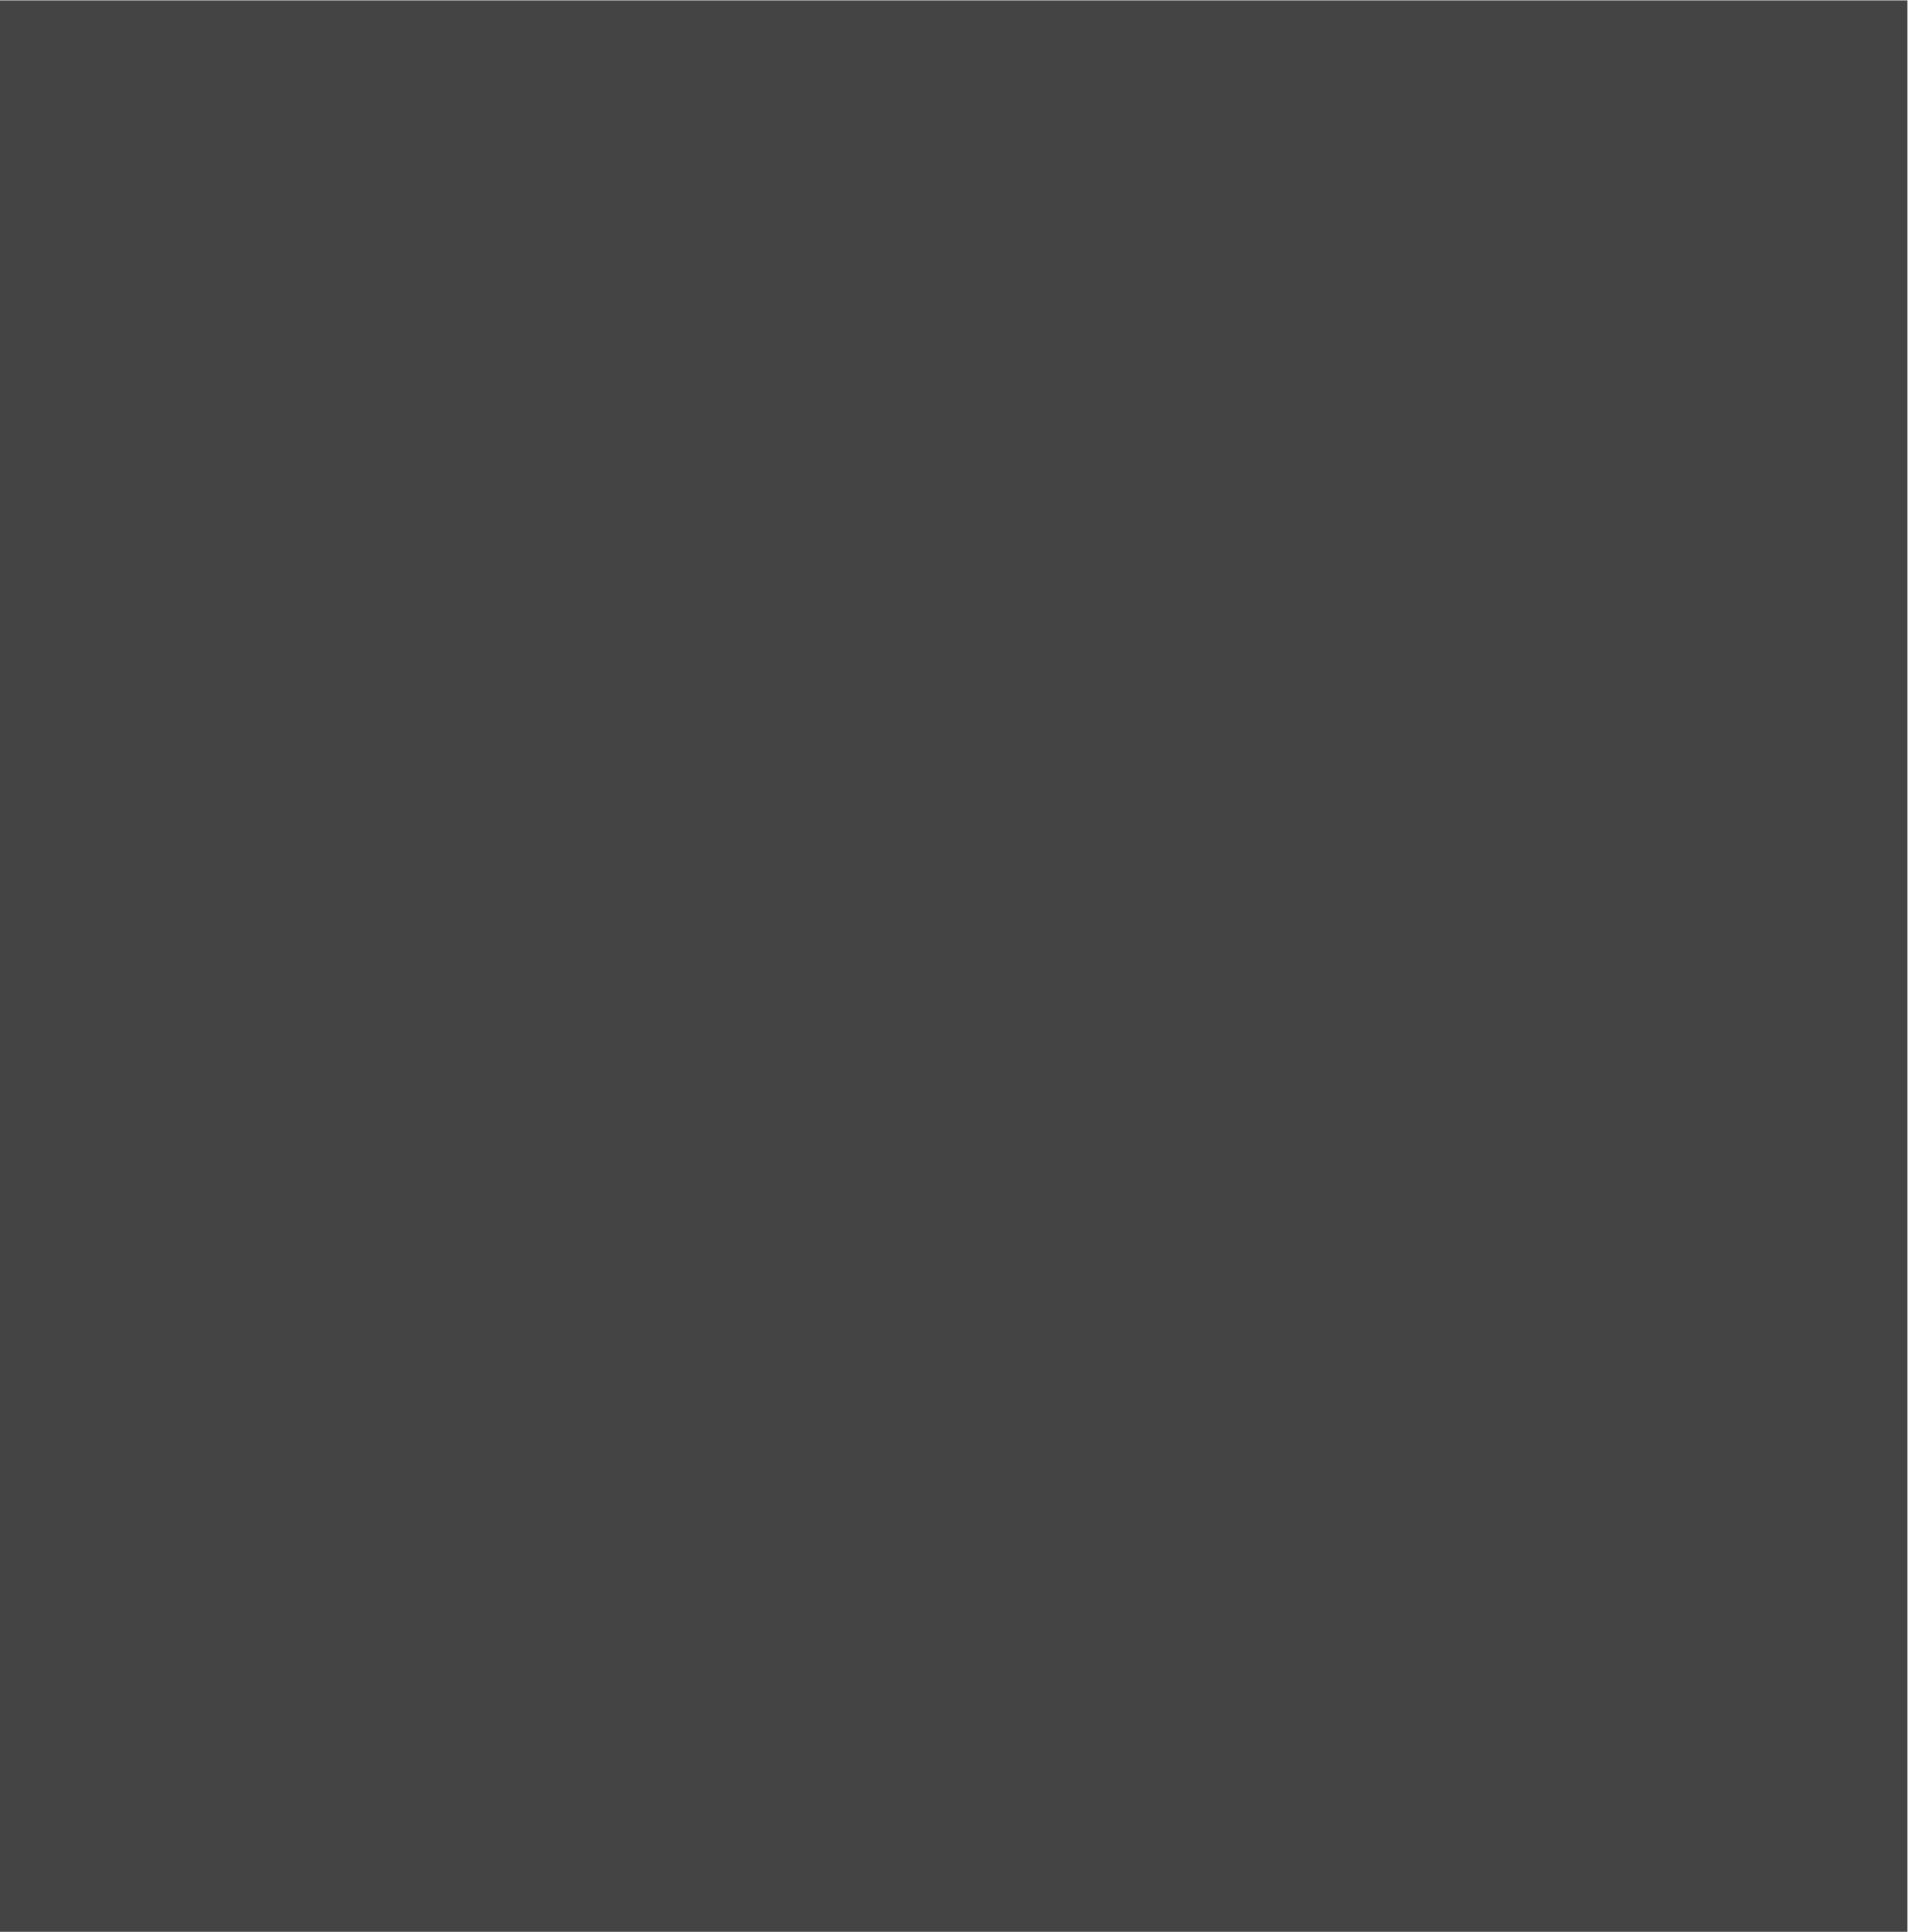 Color sample of dark gray